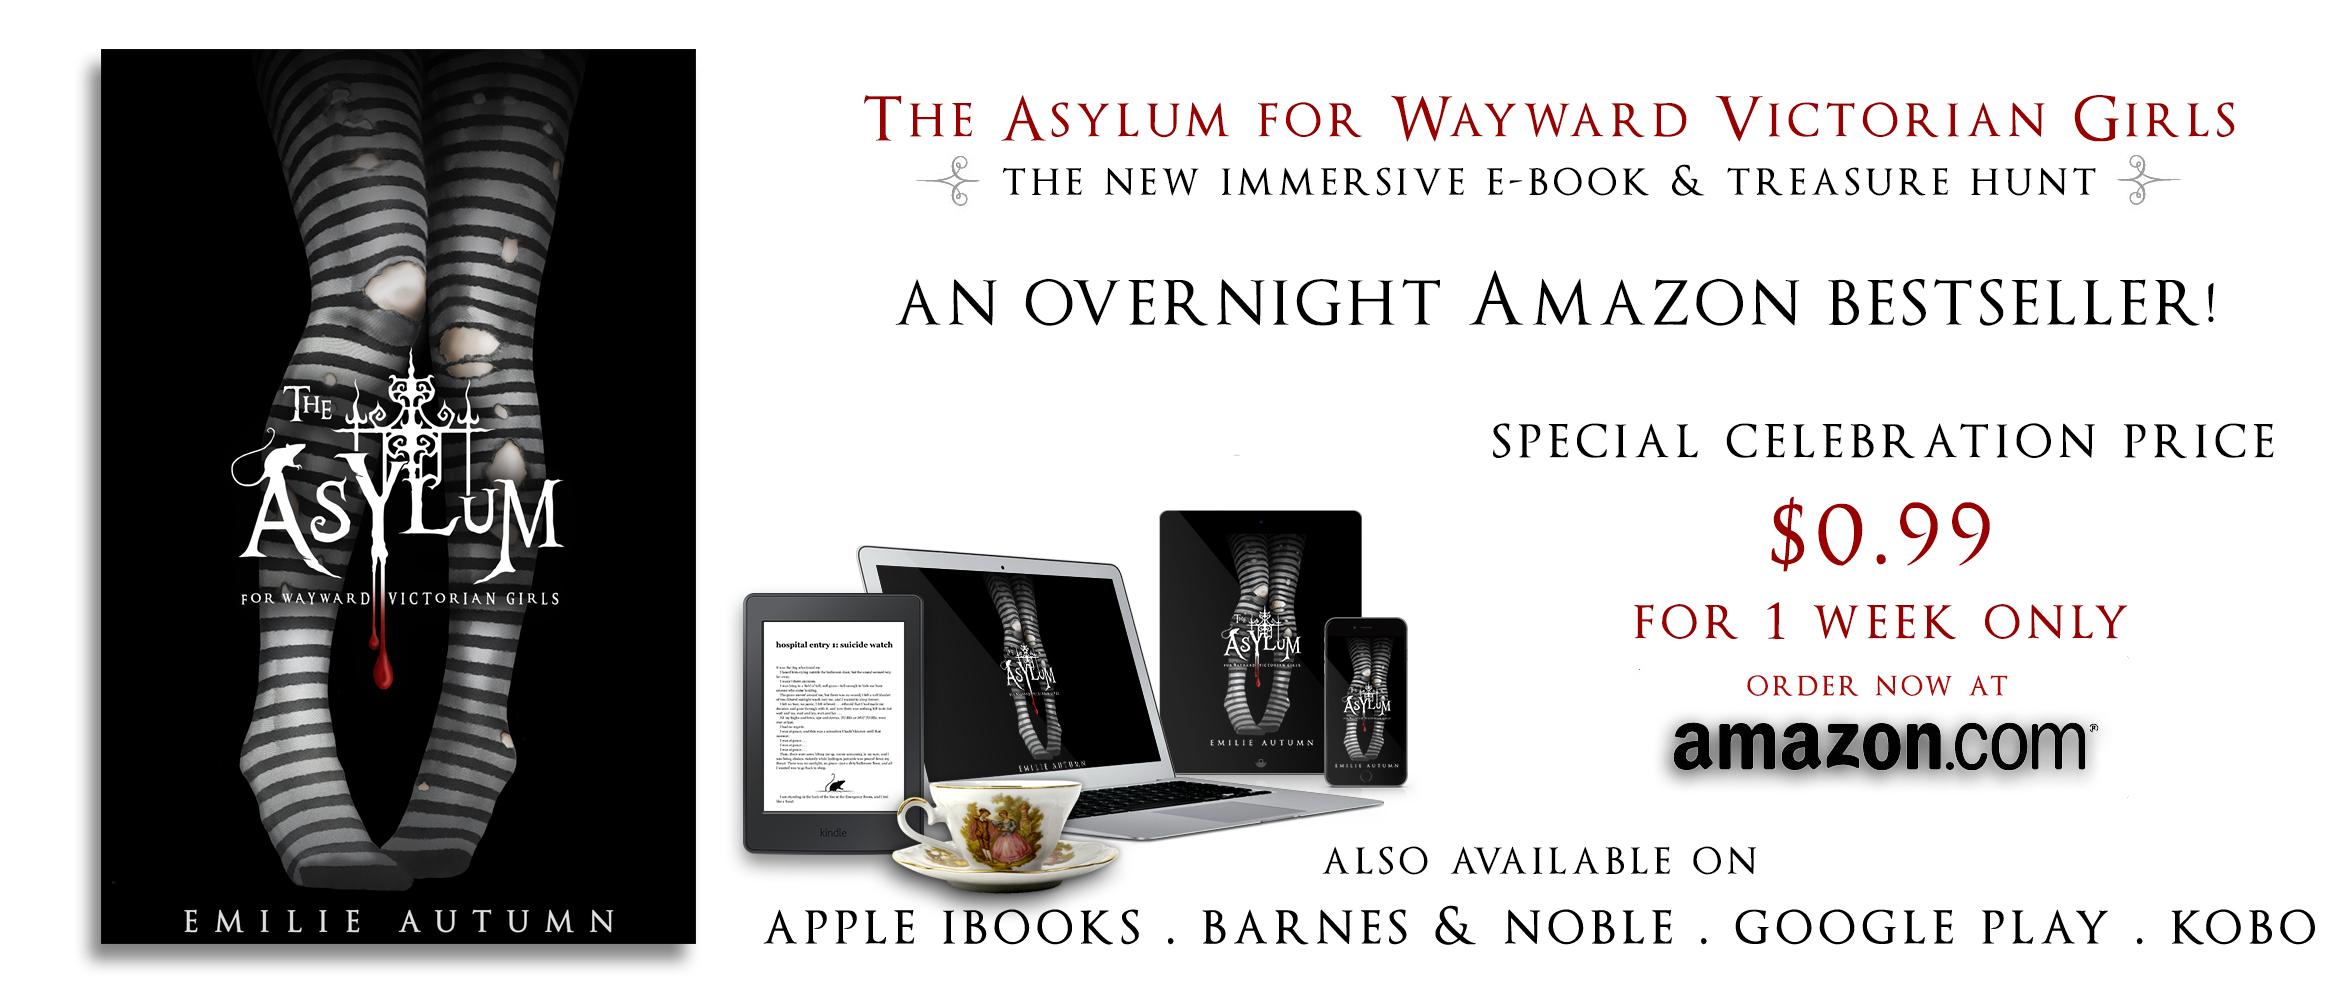 The Asylum eBook on Amazon